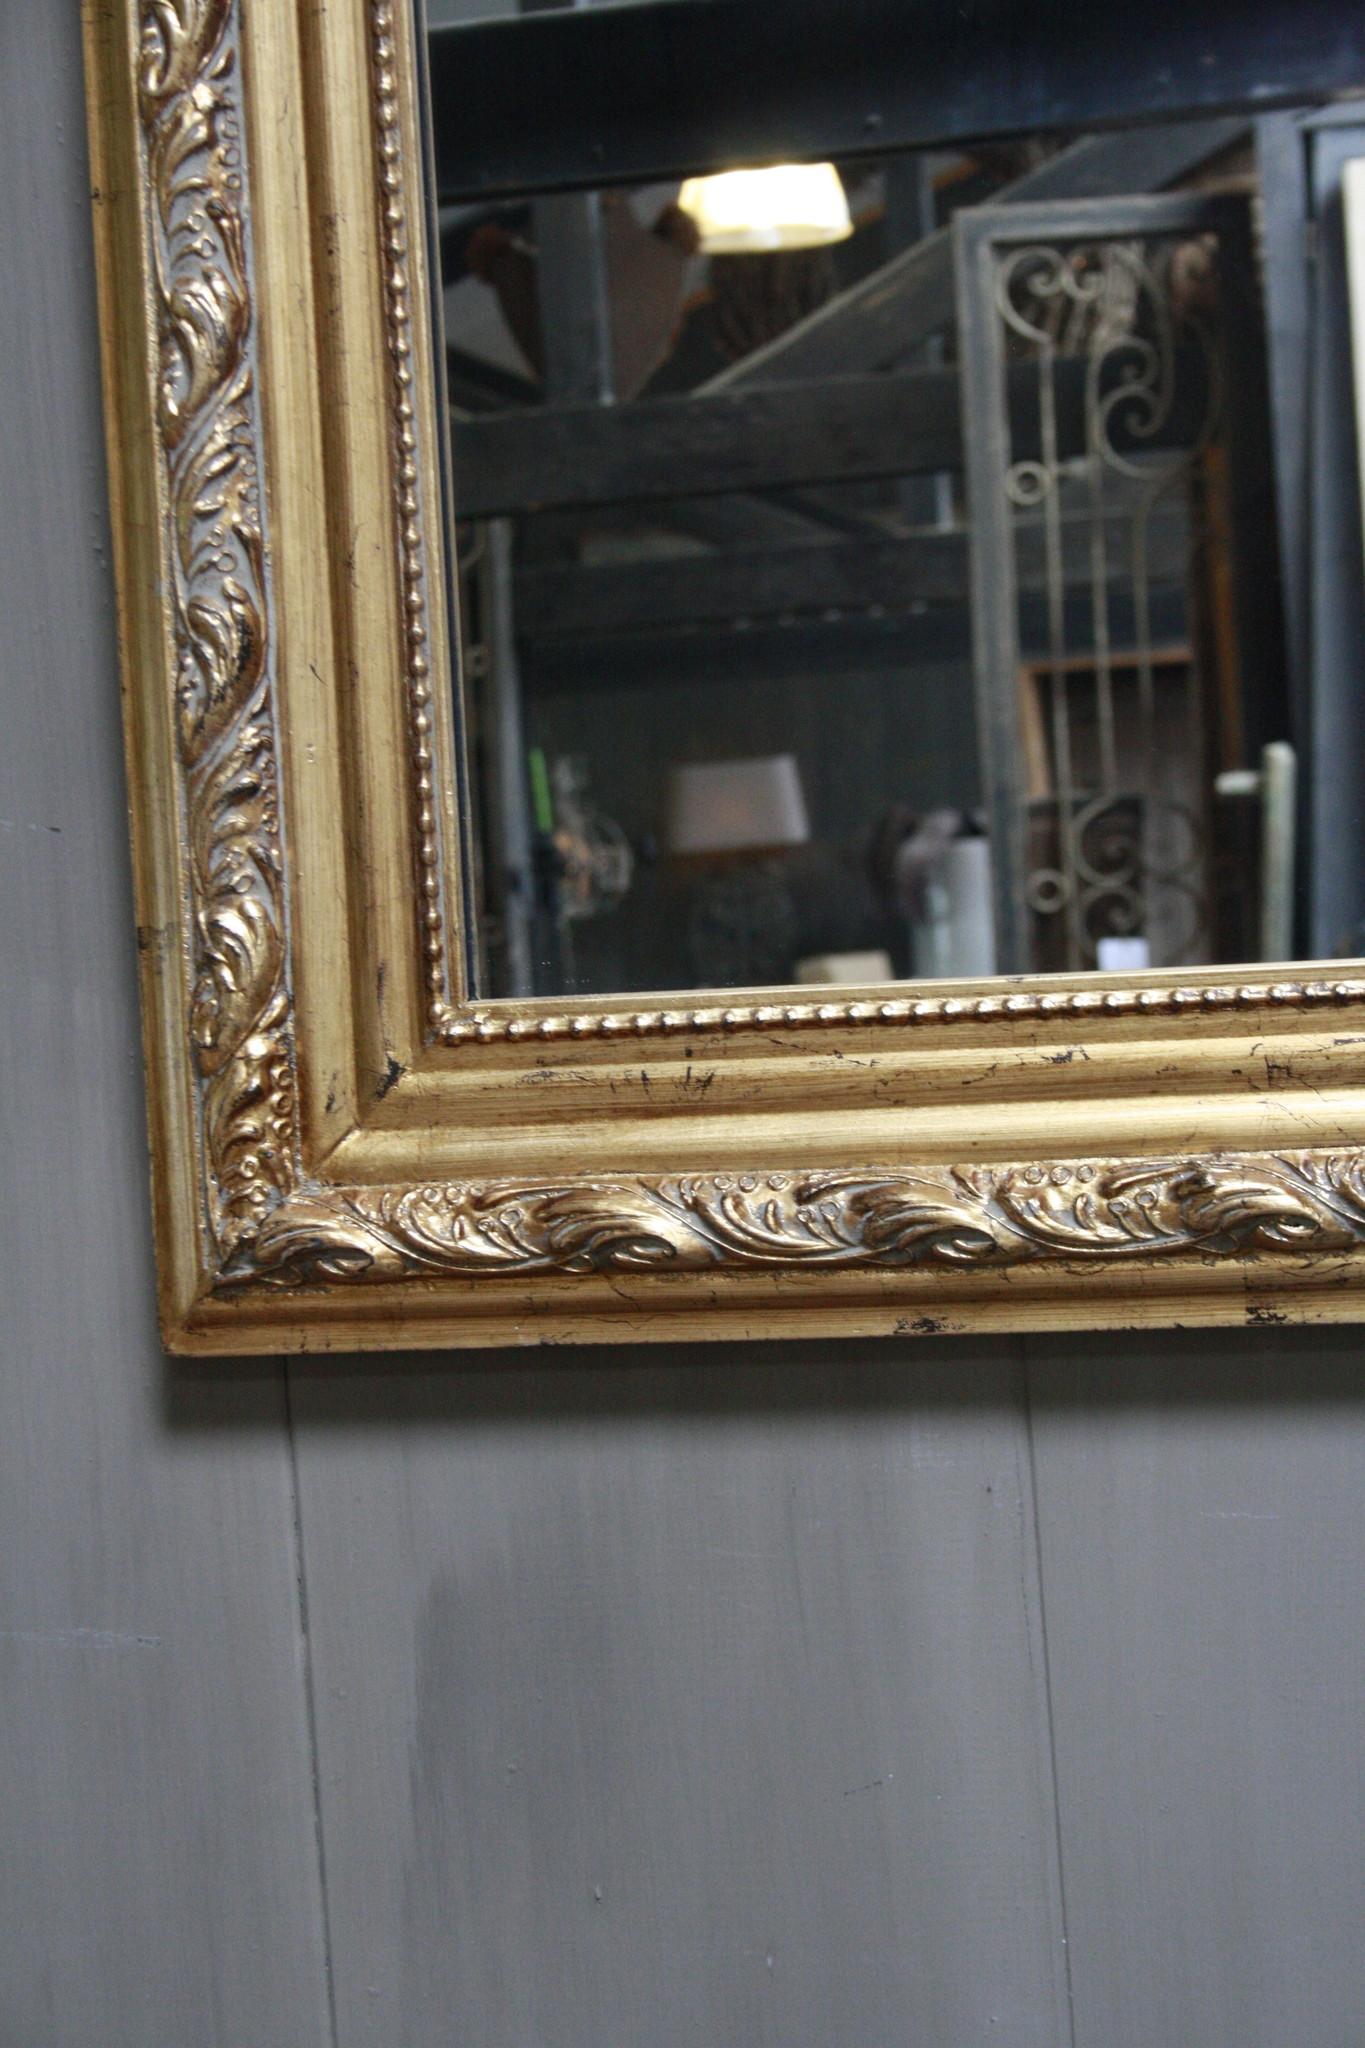 Kuifspiegel Barok Roma Goud 117 x 80 cm-4